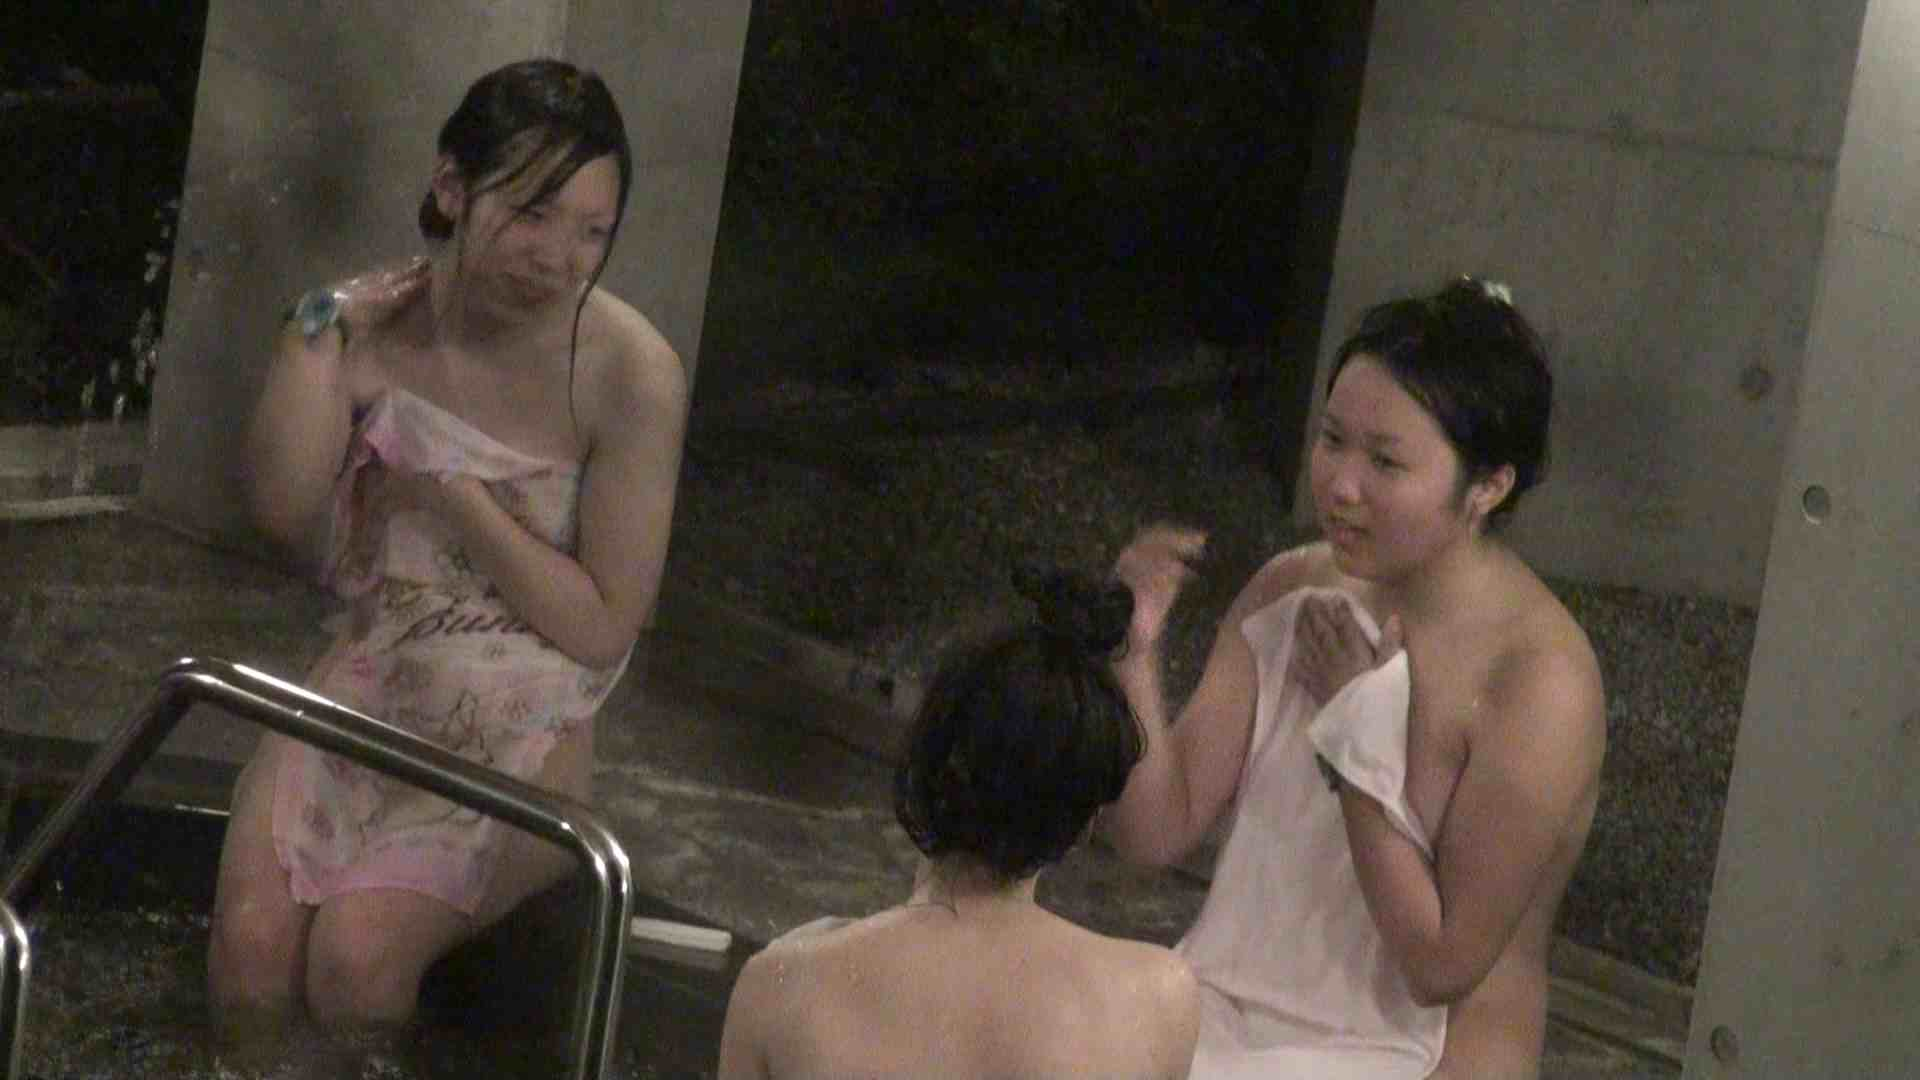 Aquaな露天風呂Vol.383 OLセックス 覗き性交動画流出 103画像 68